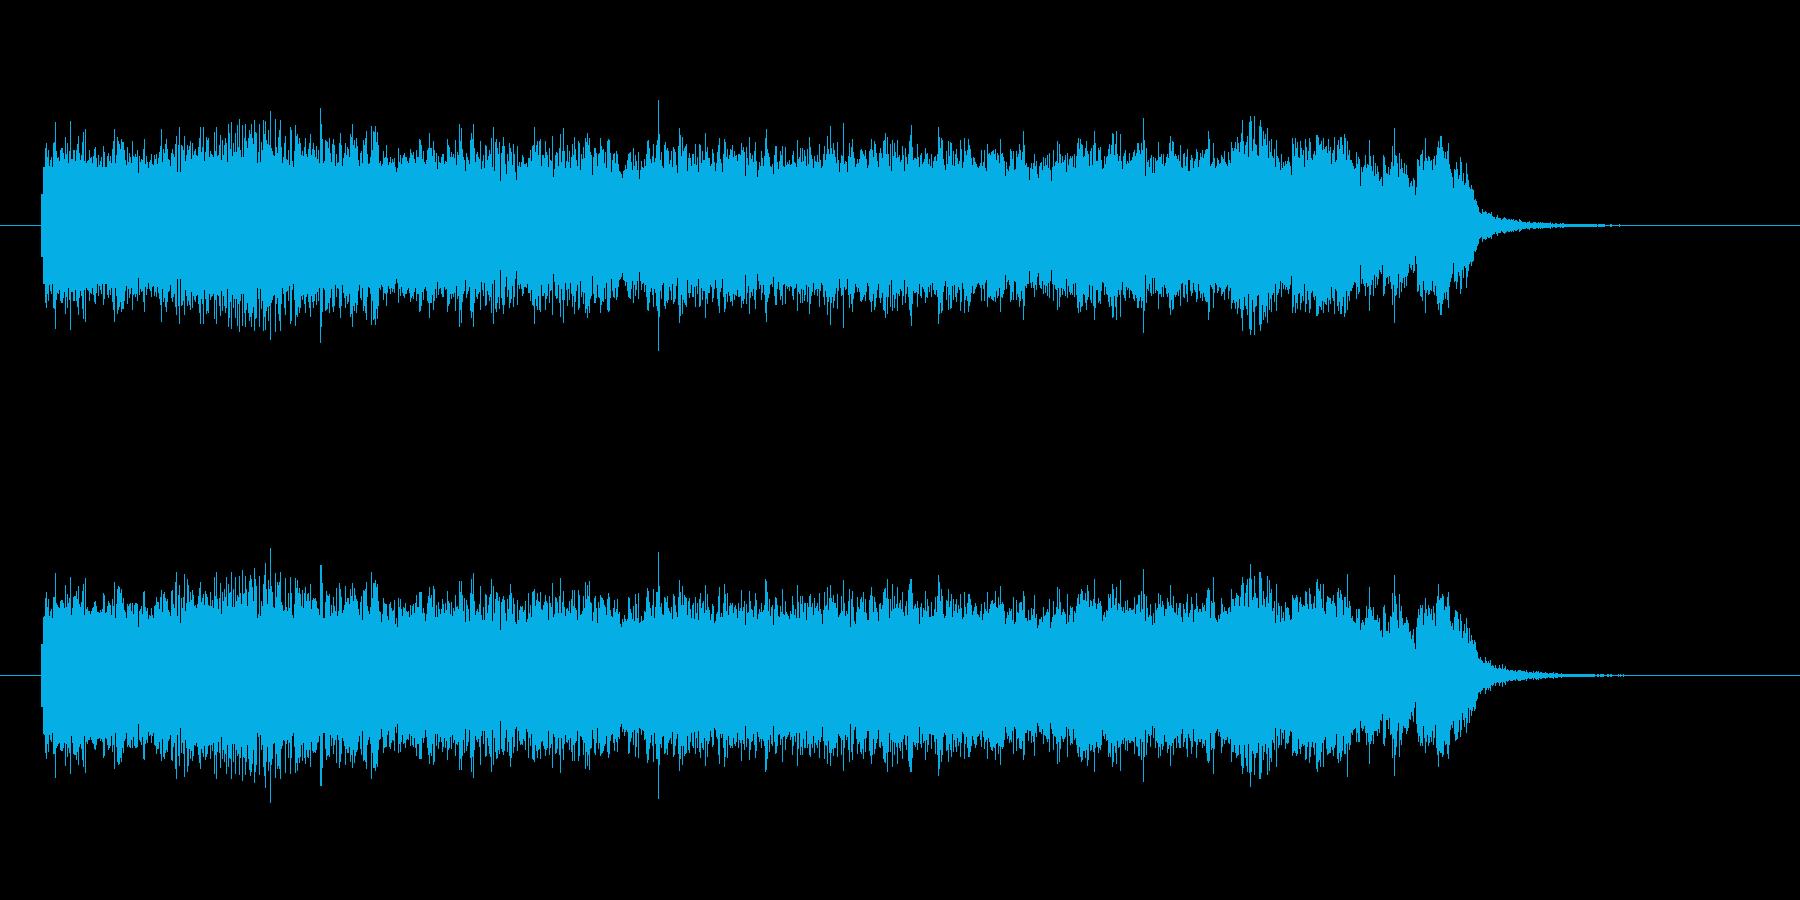 Eギター、ピックスクラッチ音の再生済みの波形